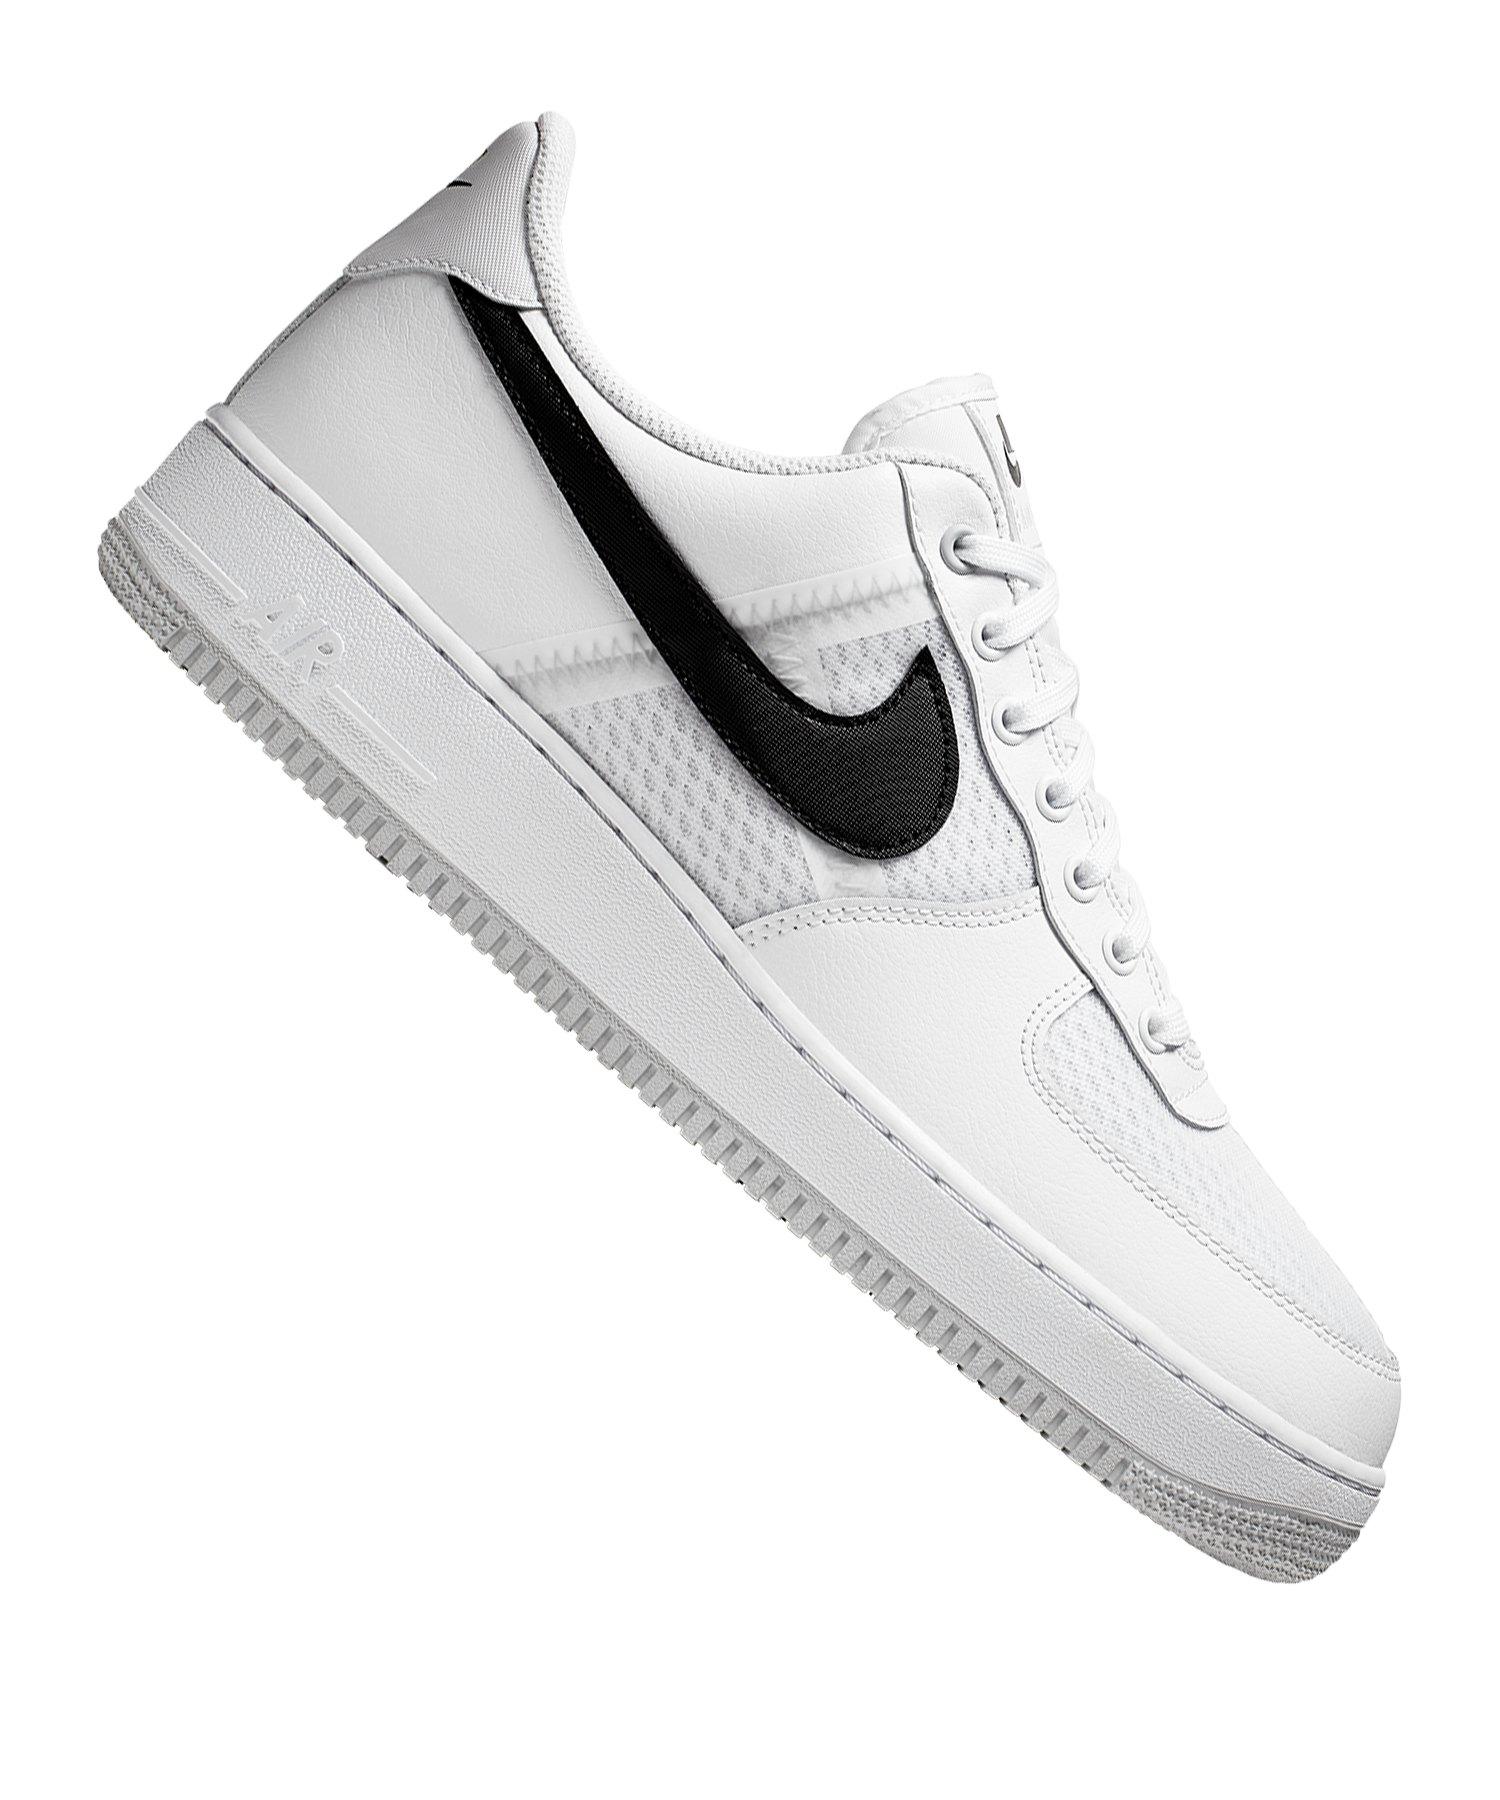 nike air force 1 07 weiß schwarz